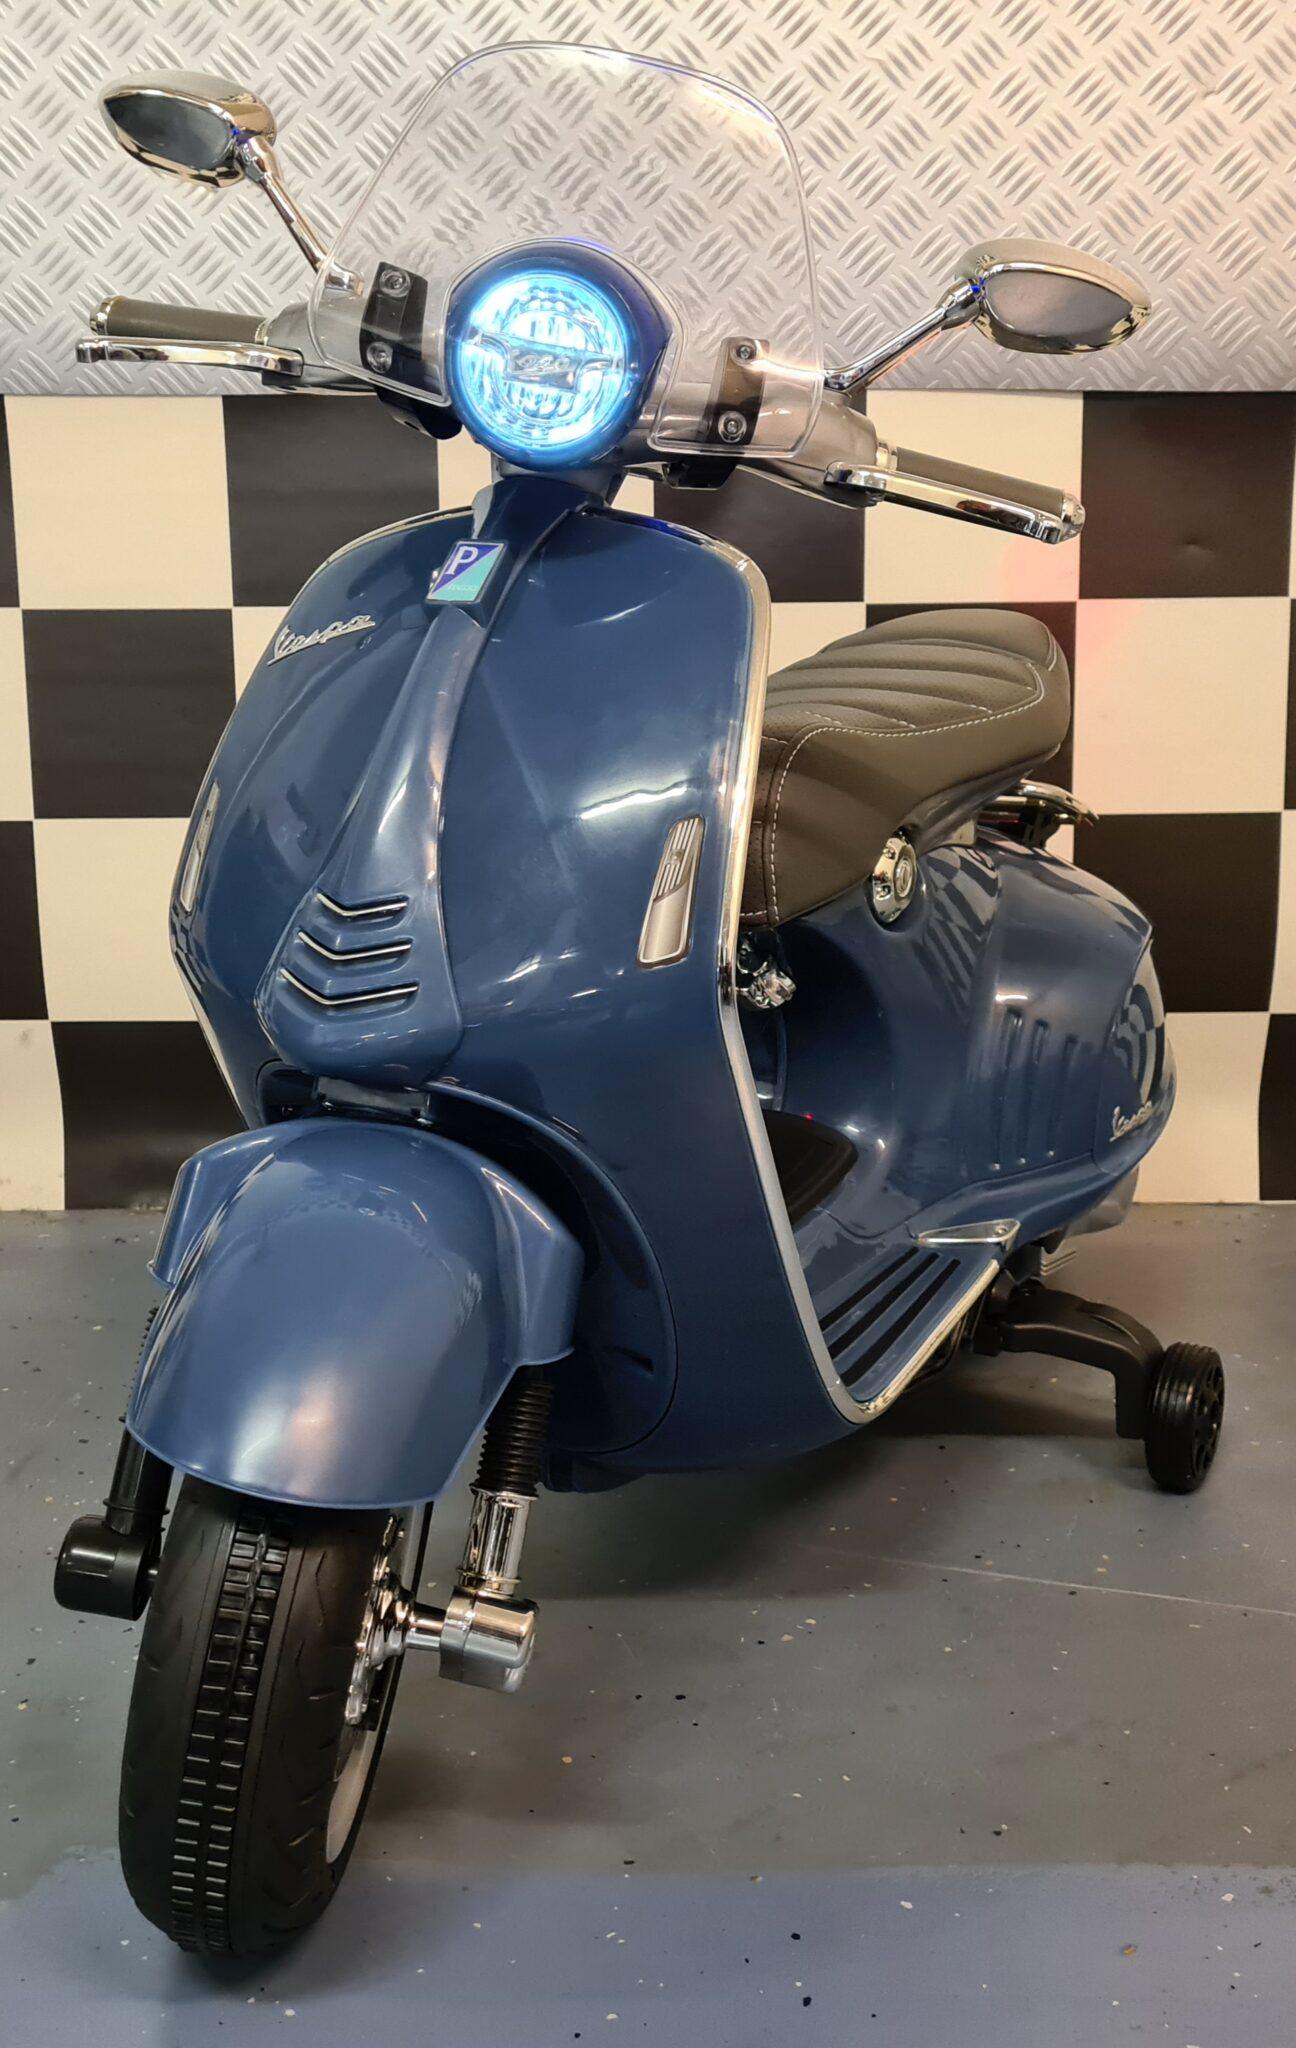 Scooter Vespa 946 kinderscooter 12 volt blauw